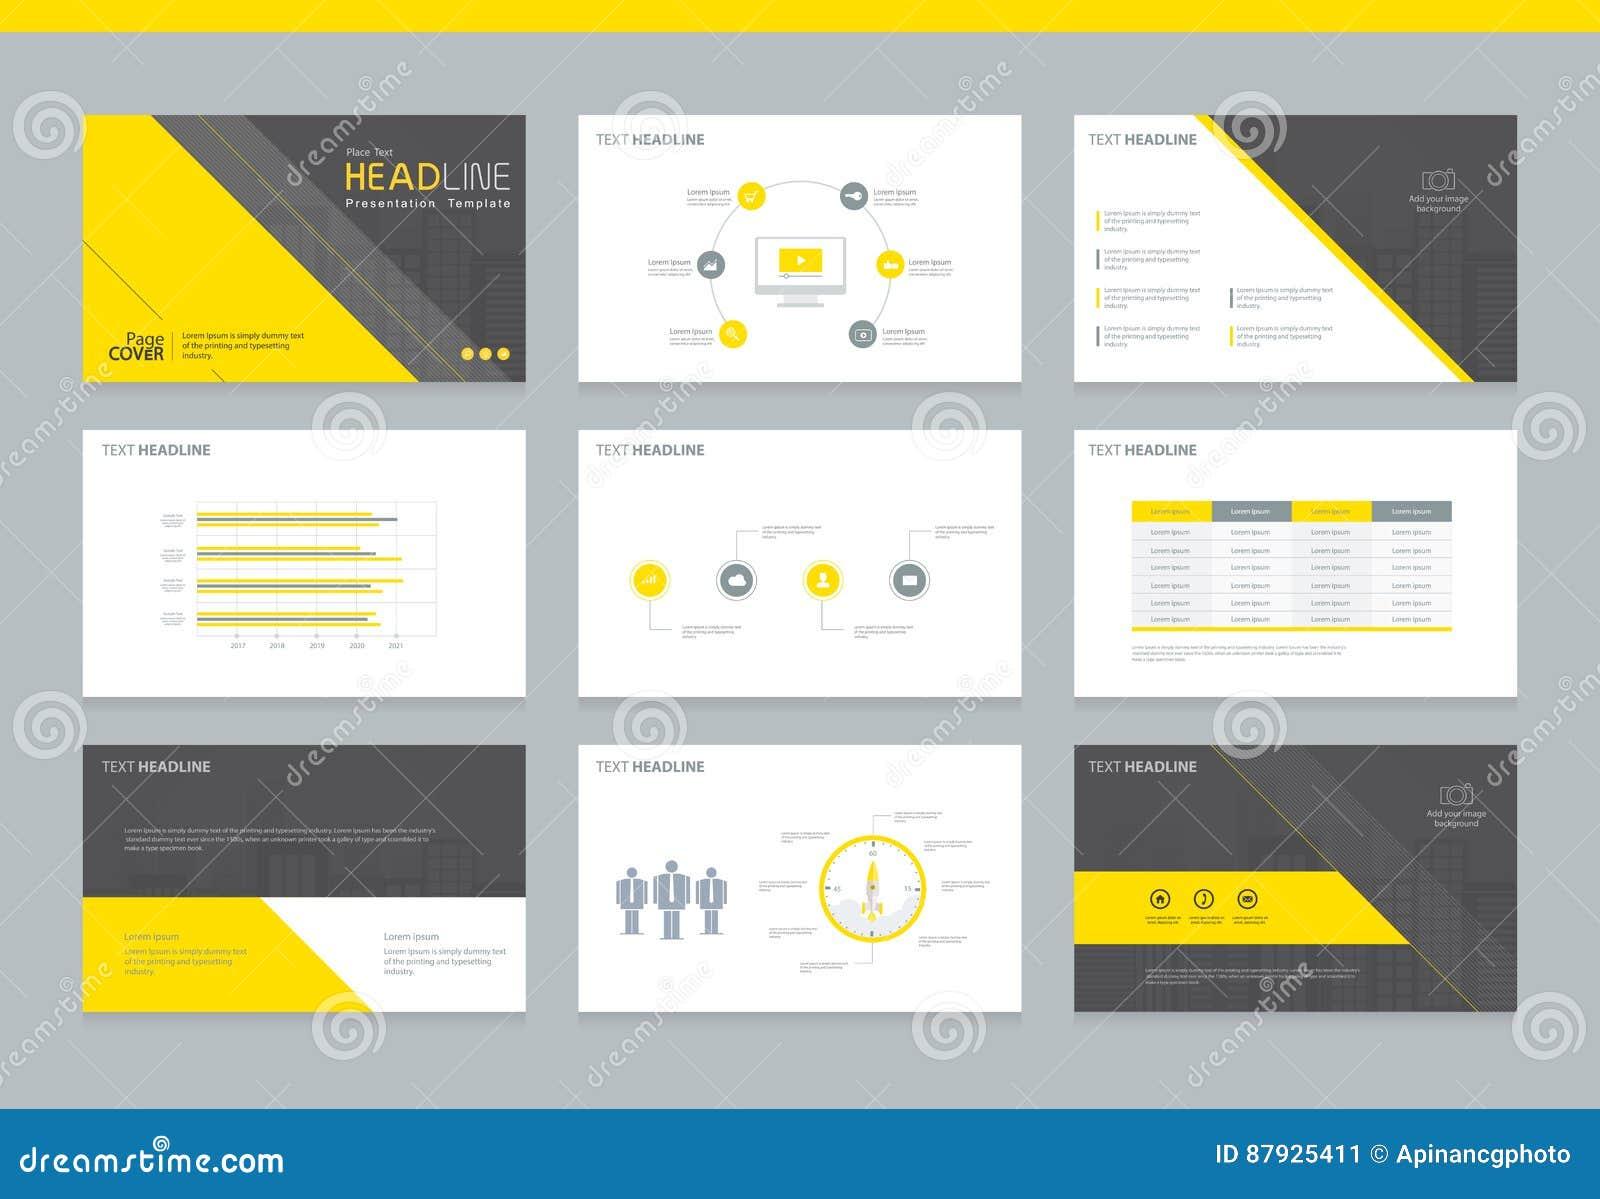 business presentation design template background stock vector